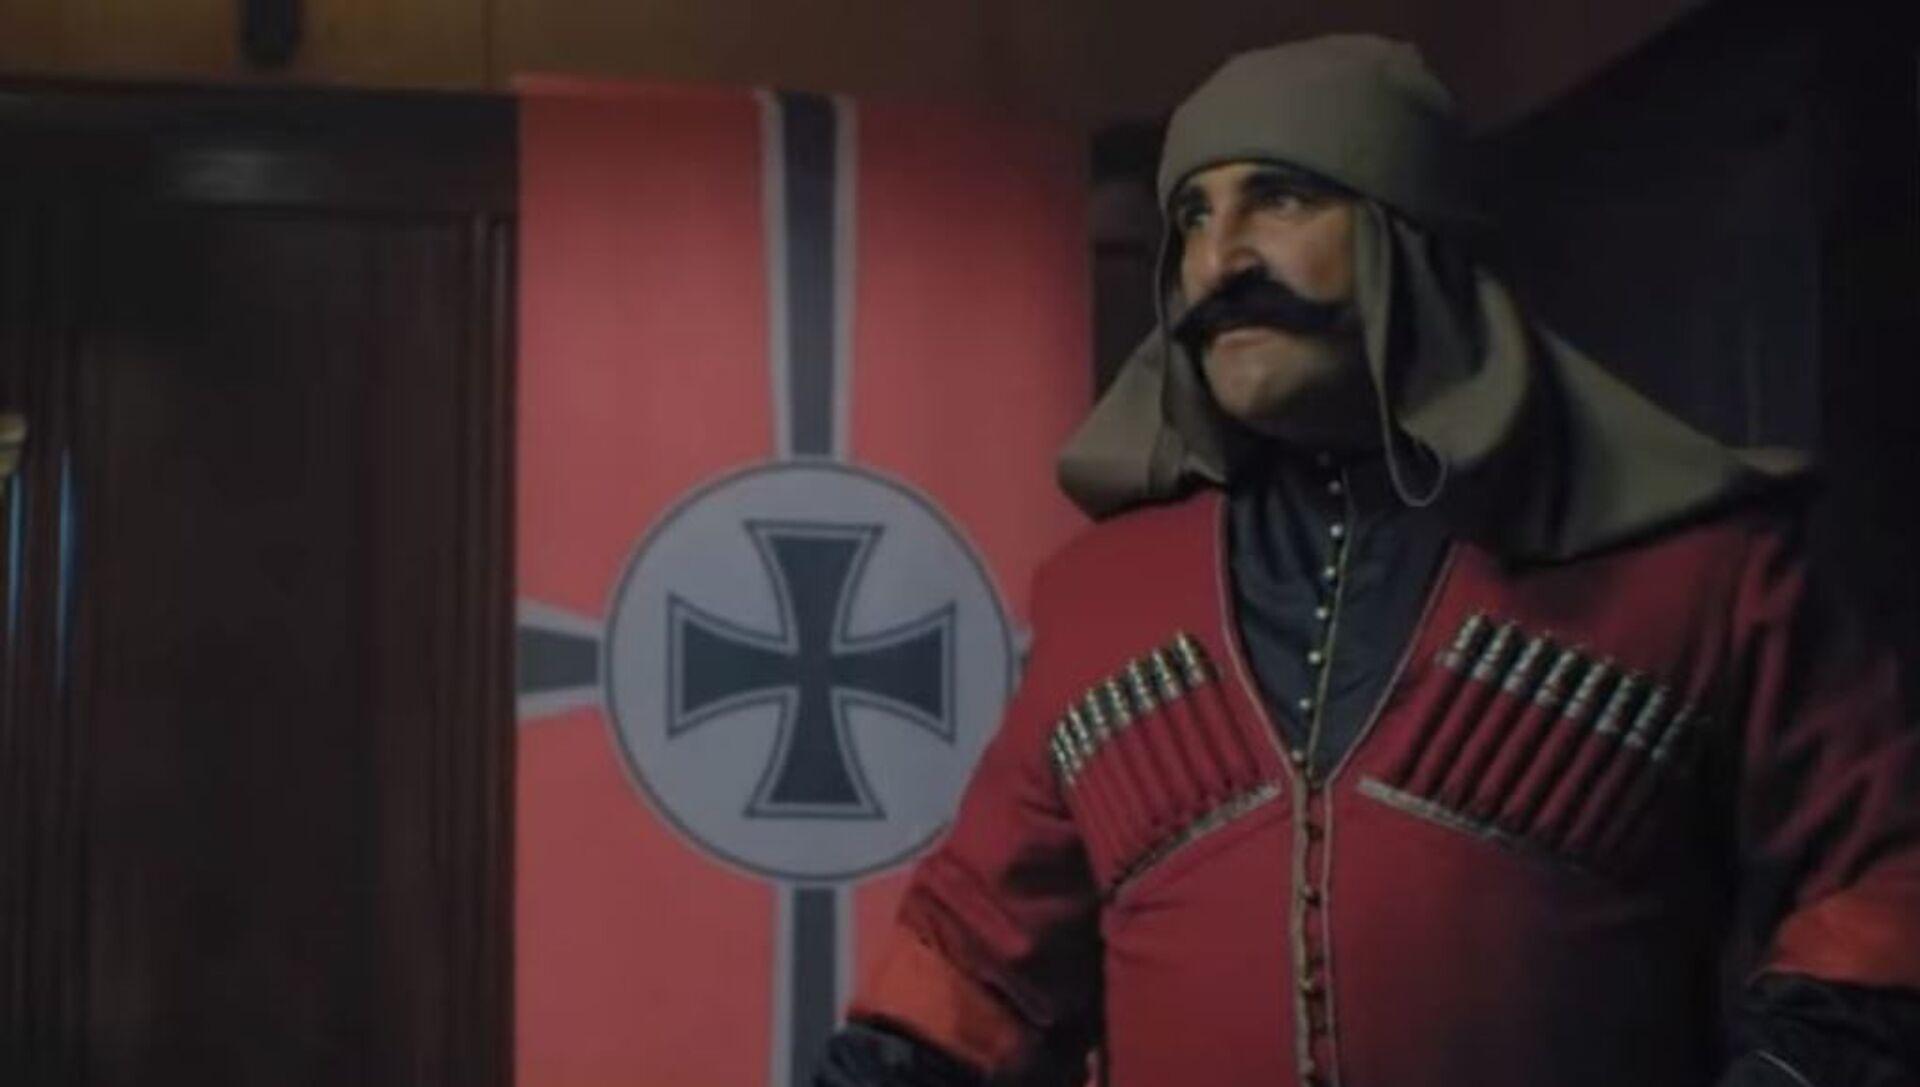 Kадр из фильма Спасибо деду за Победу - Sputnik Абхазия, 1920, 27.08.2021